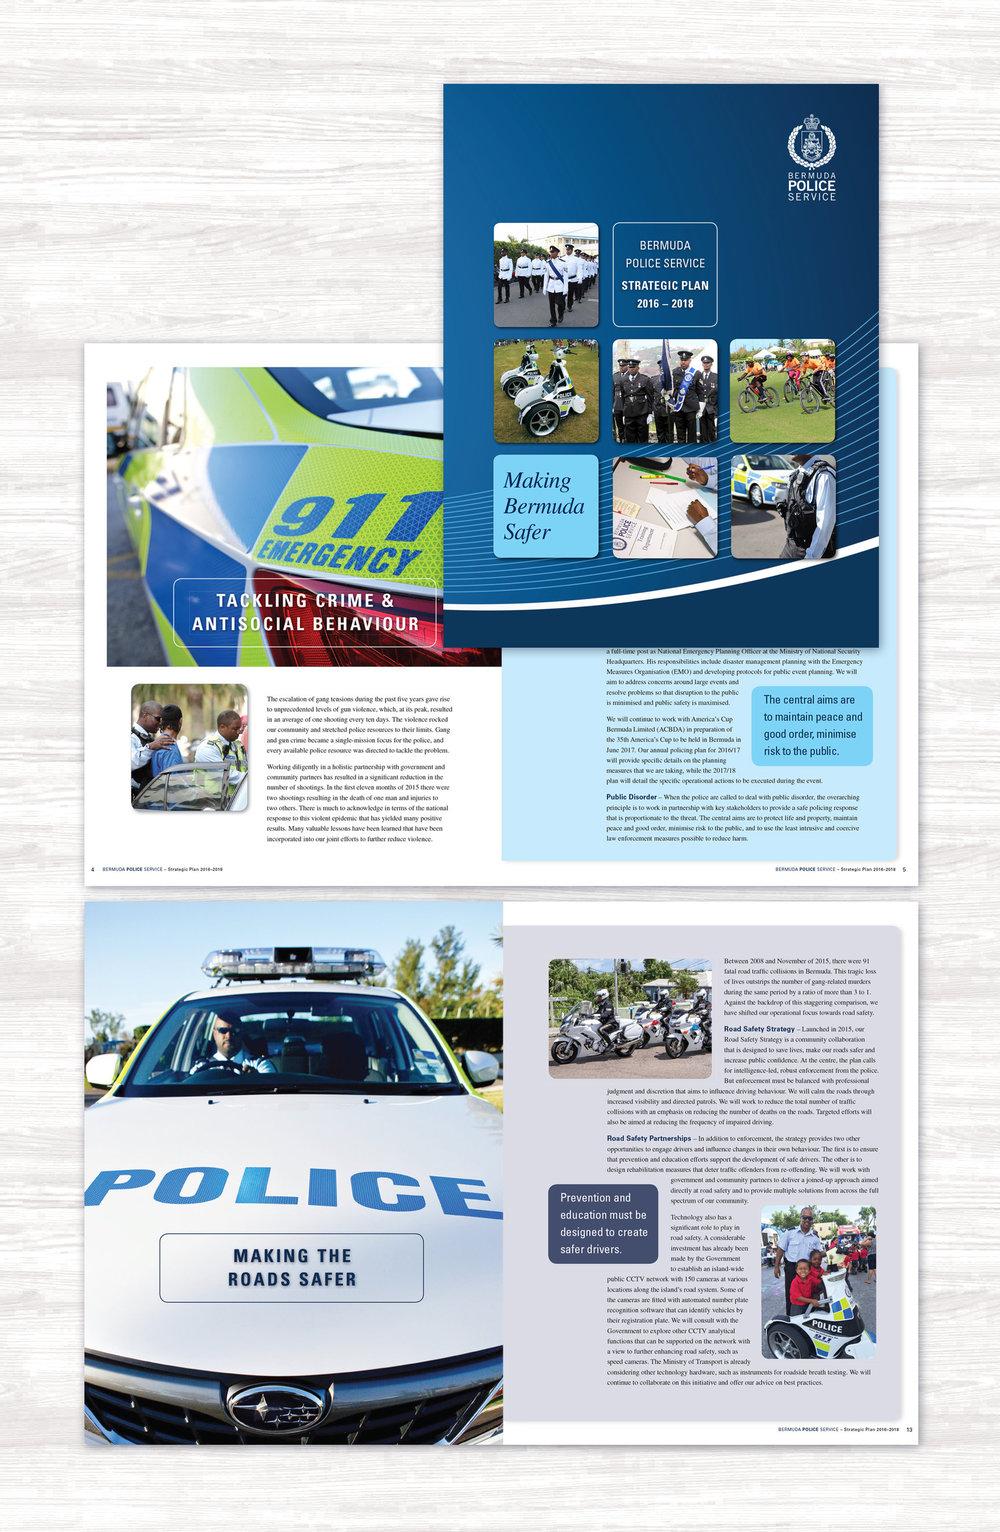 Corp-police.jpg